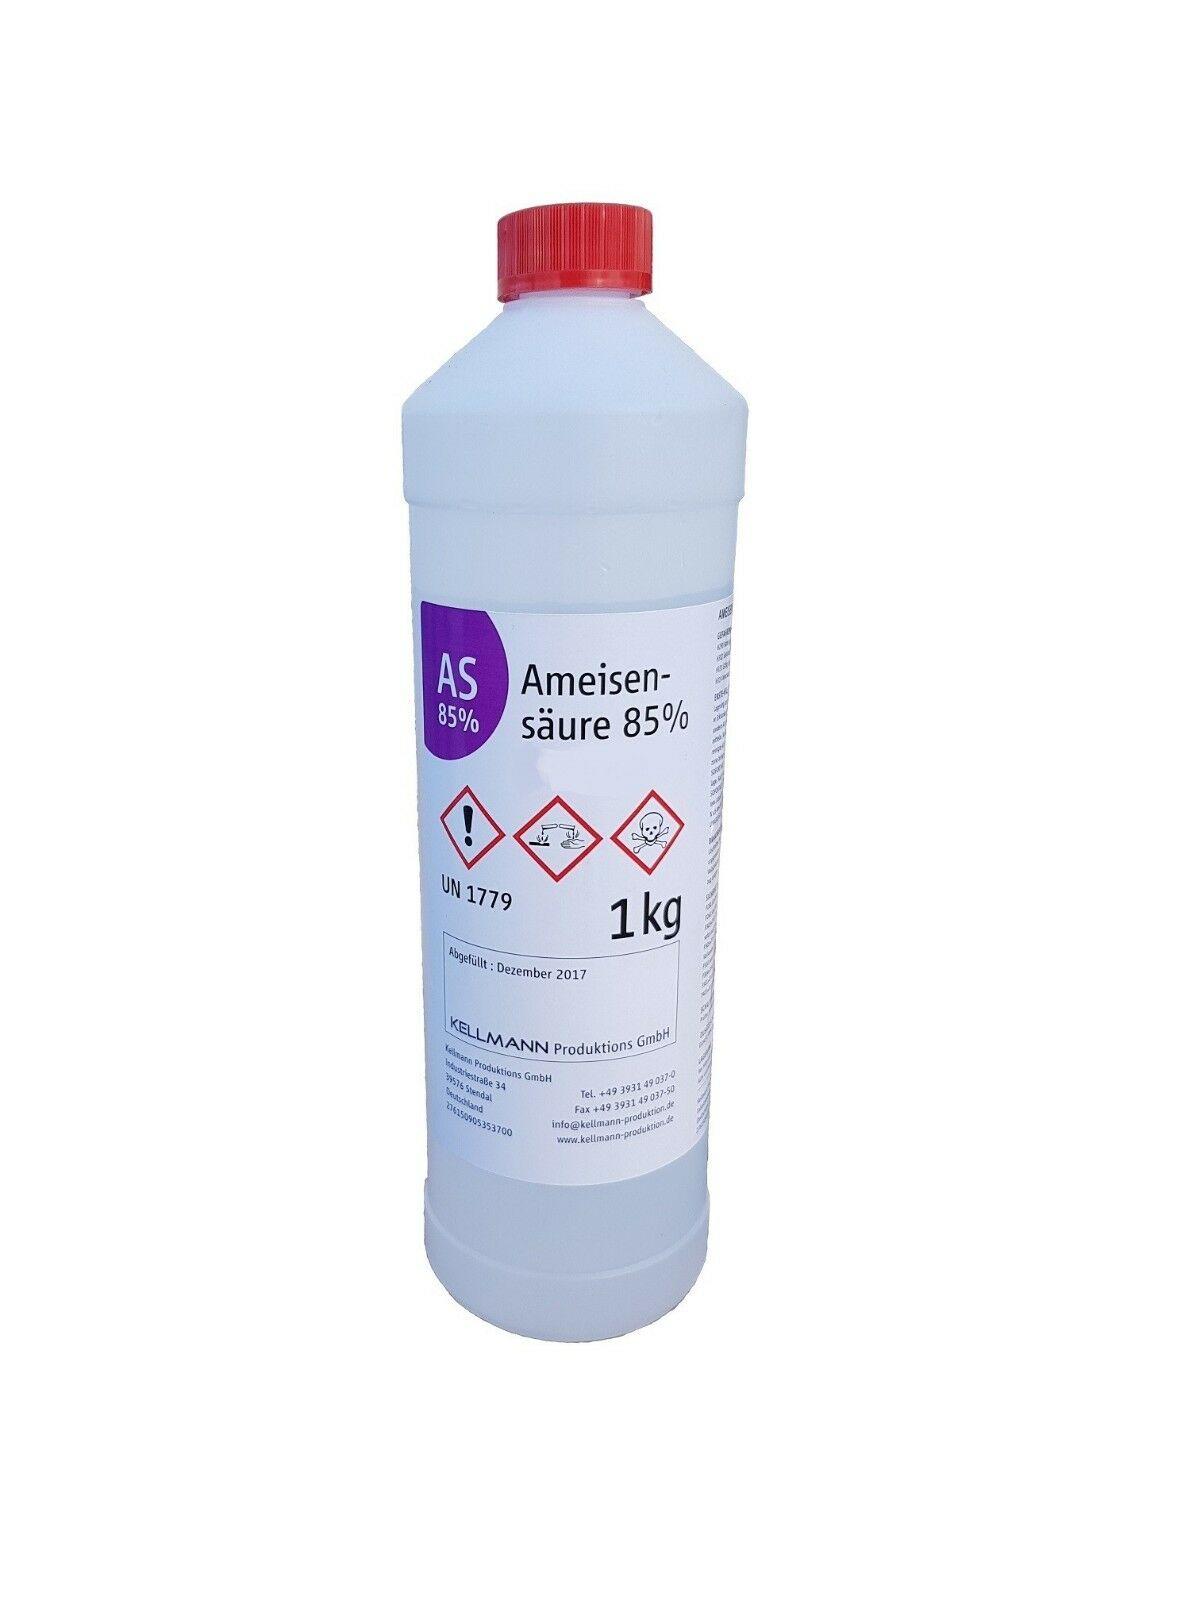 ameisensaure-85-ige-882-003287iwxg2sGivjB